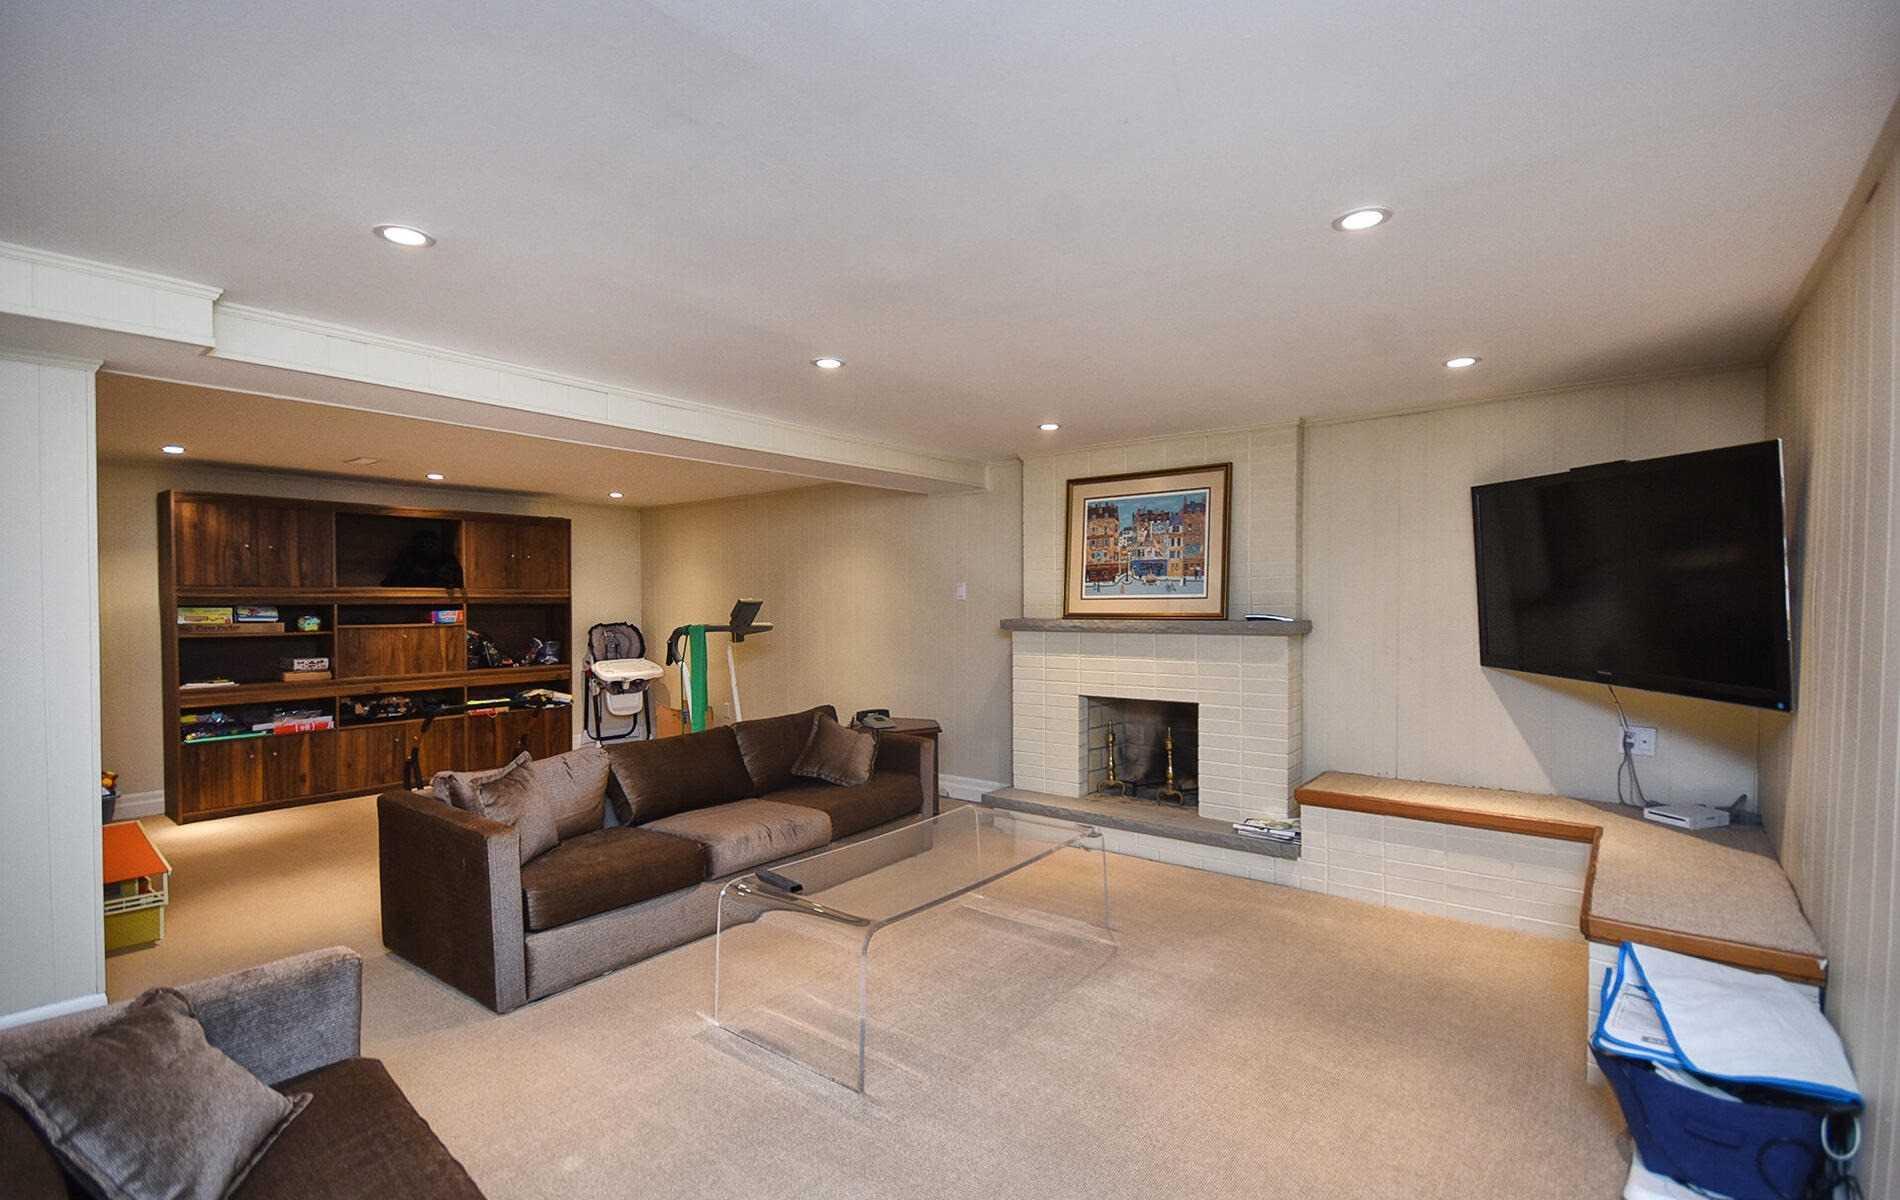 Detached house For Sale In Markham - 72 Laureleaf Rd, Markham, Ontario, Canada L3T2Y1 , 3 Bedrooms Bedrooms, ,5 BathroomsBathrooms,Detached,For Sale,Laureleaf